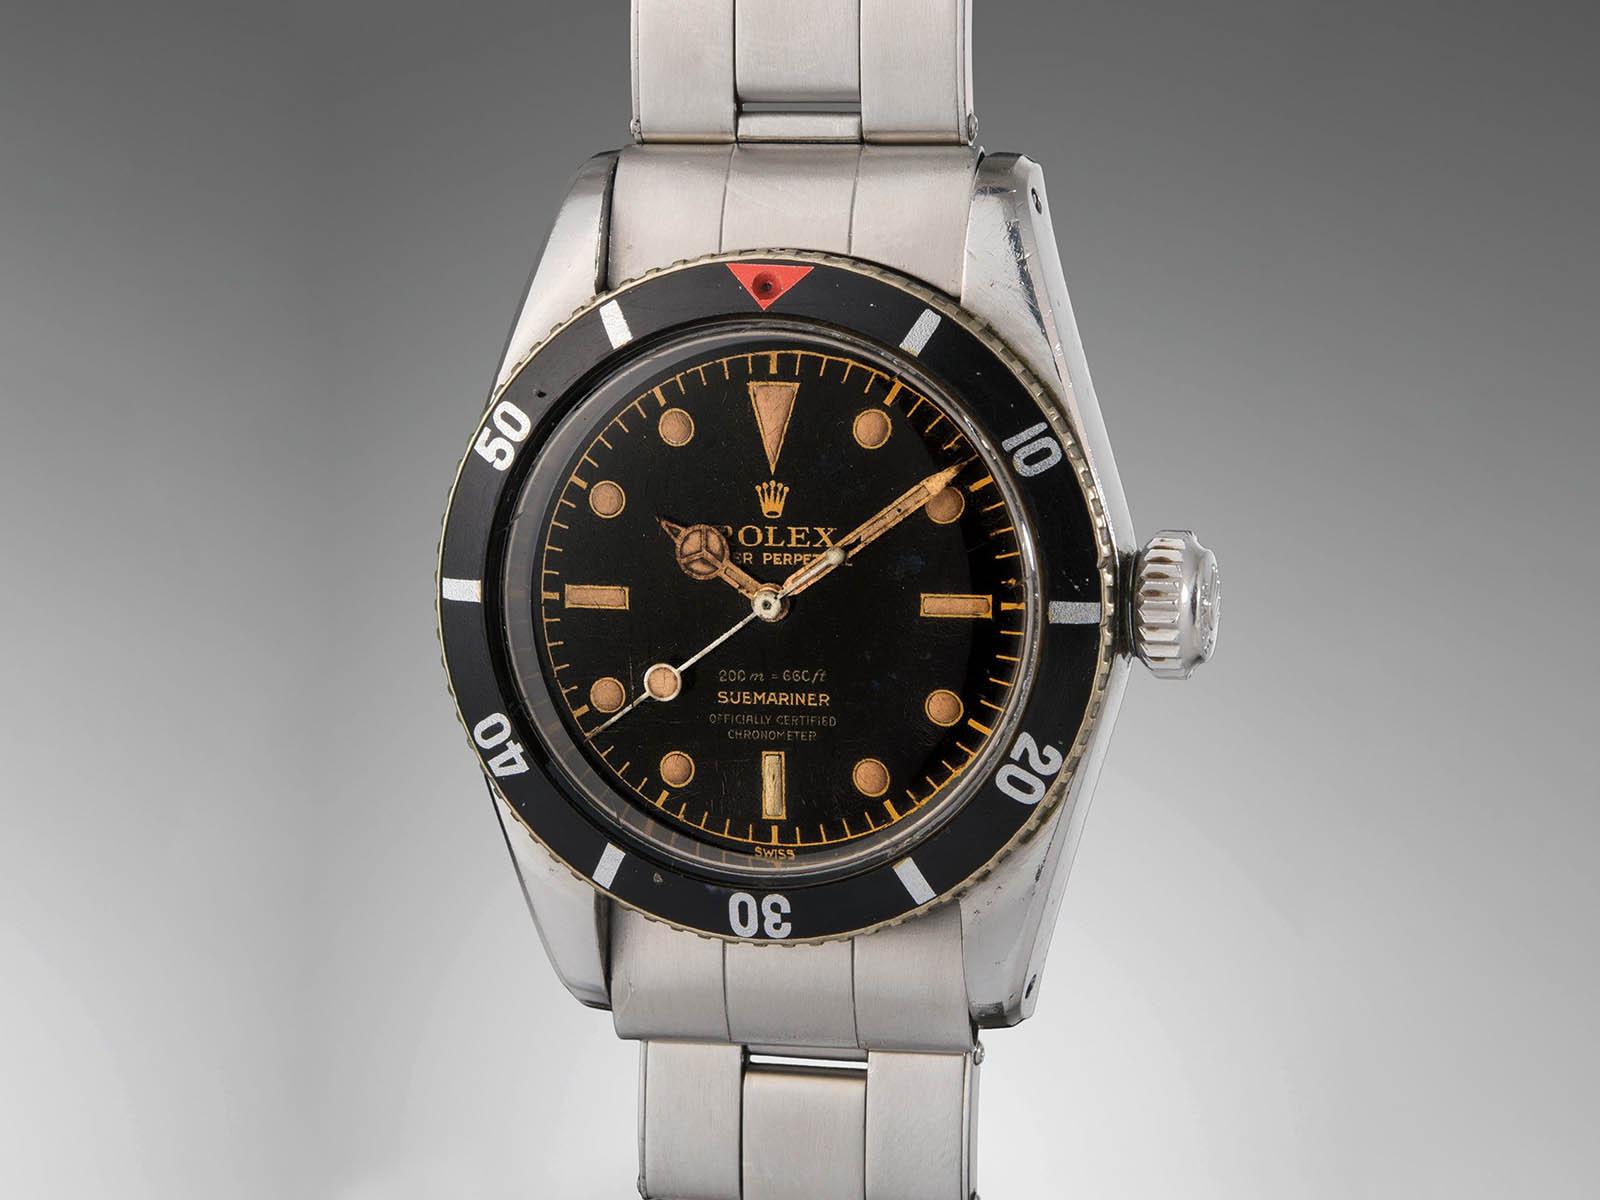 sean-connery-rolex-submariner-6538-james-bond-007-dr-no-2.jpg